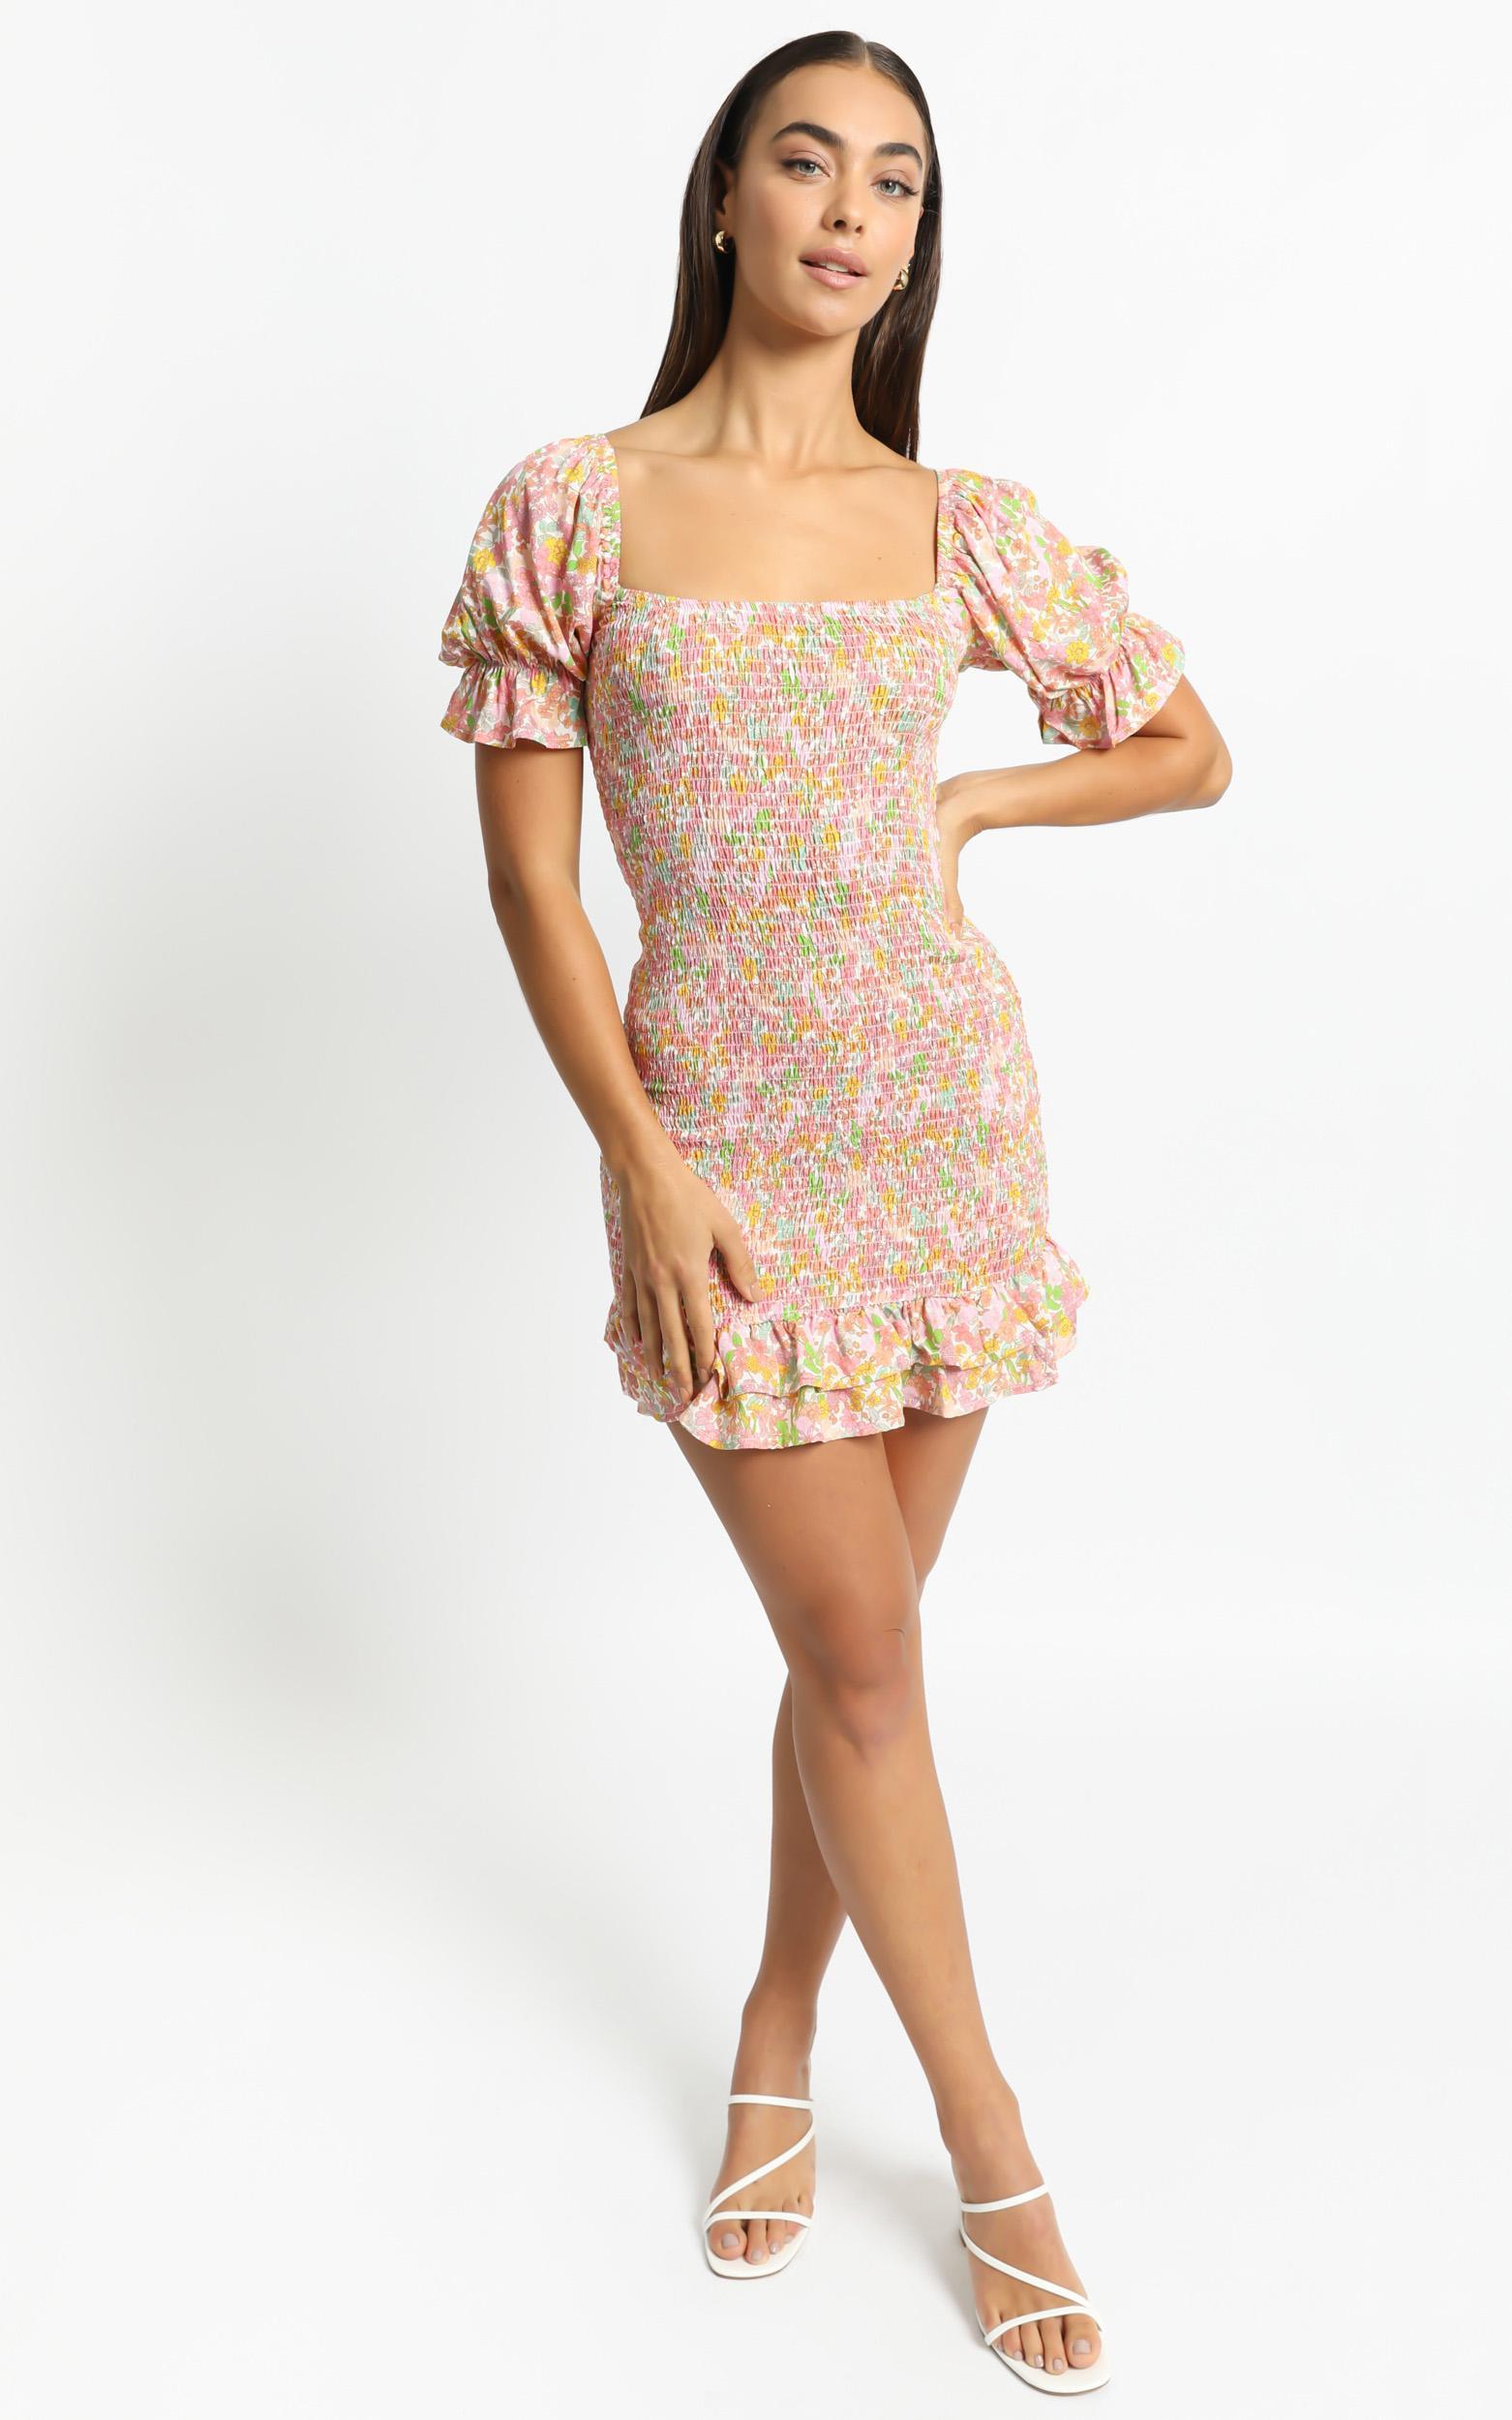 Lilja Dress in Flower Field - 06, PNK1, hi-res image number null